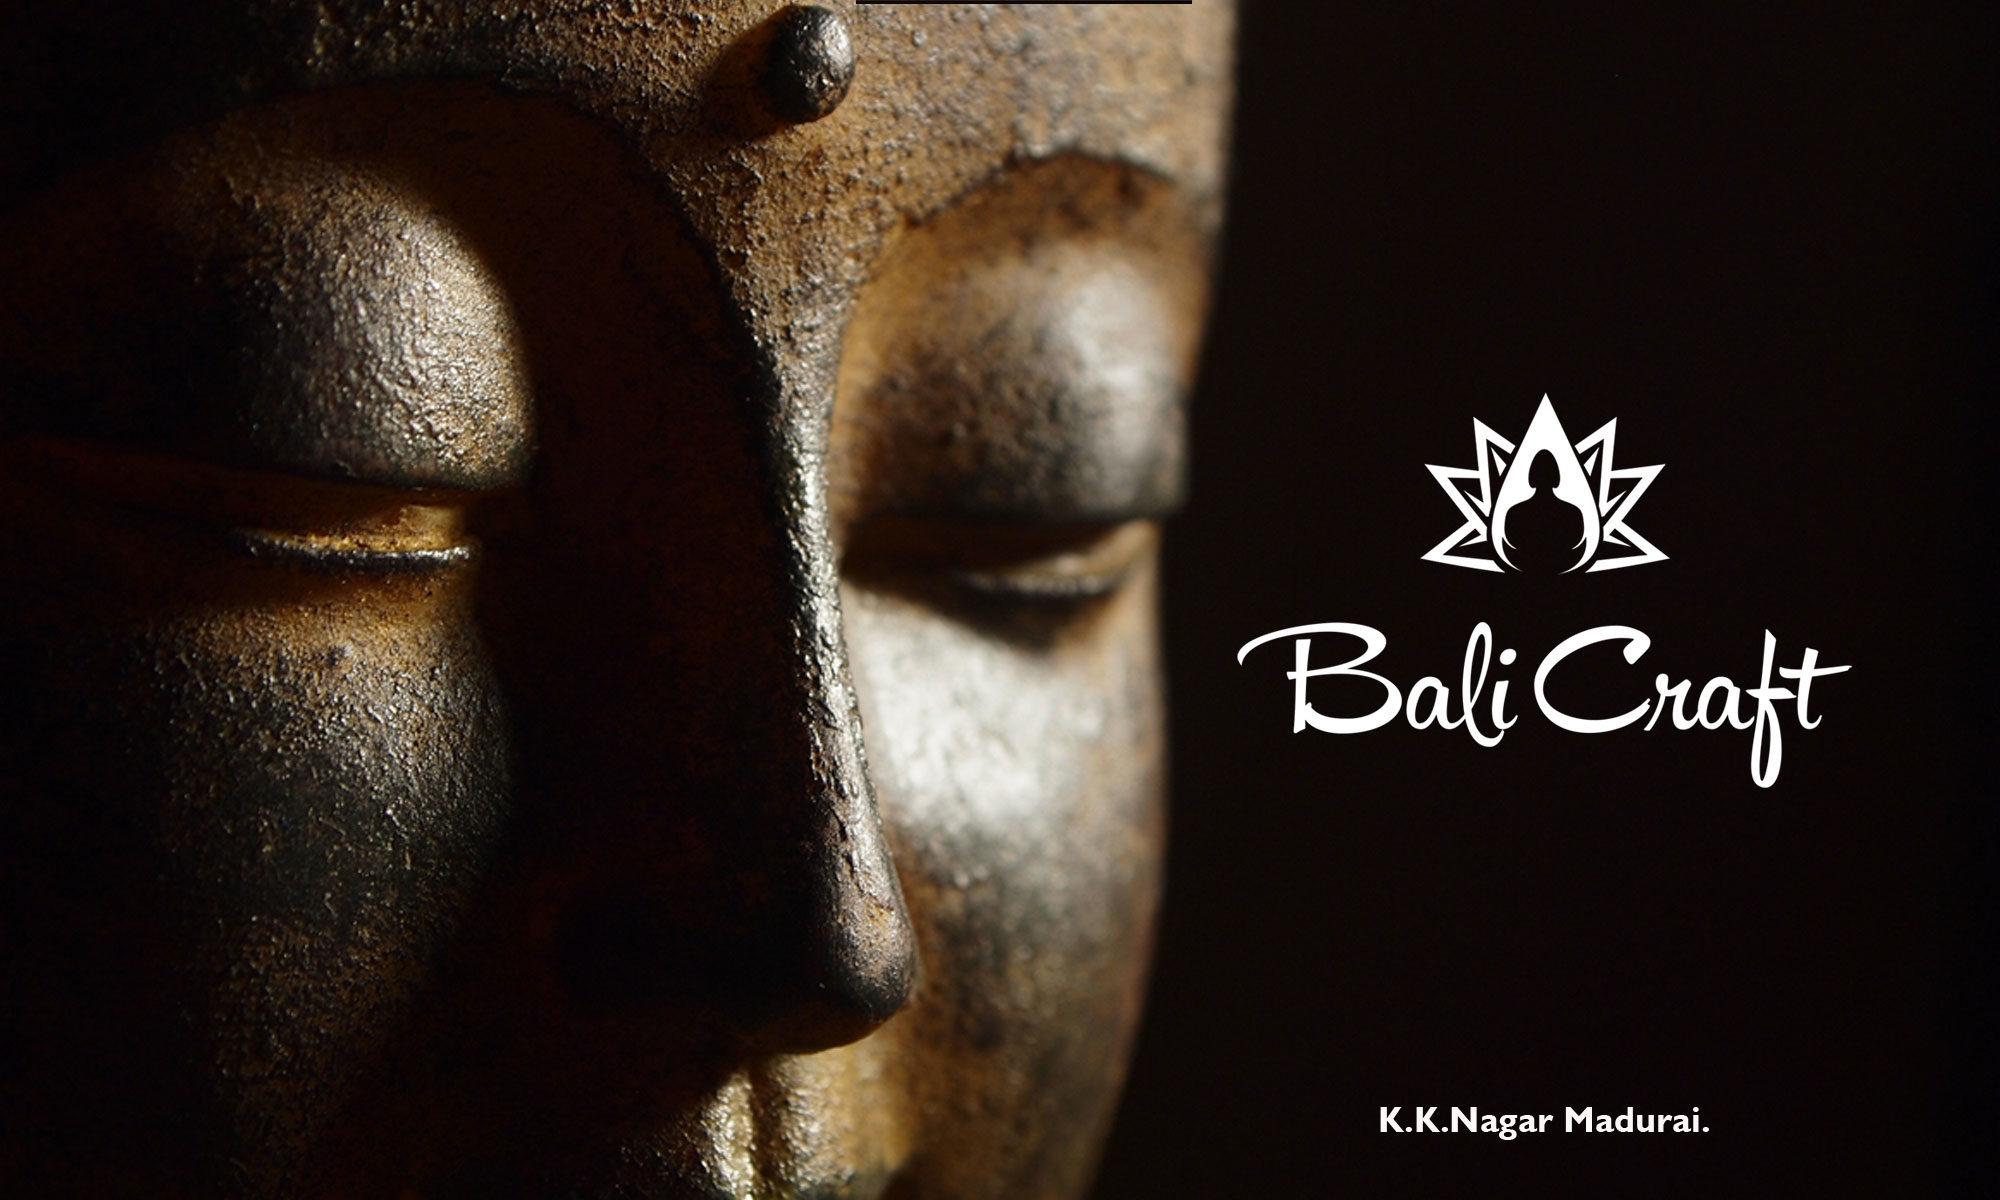 Bali Craft